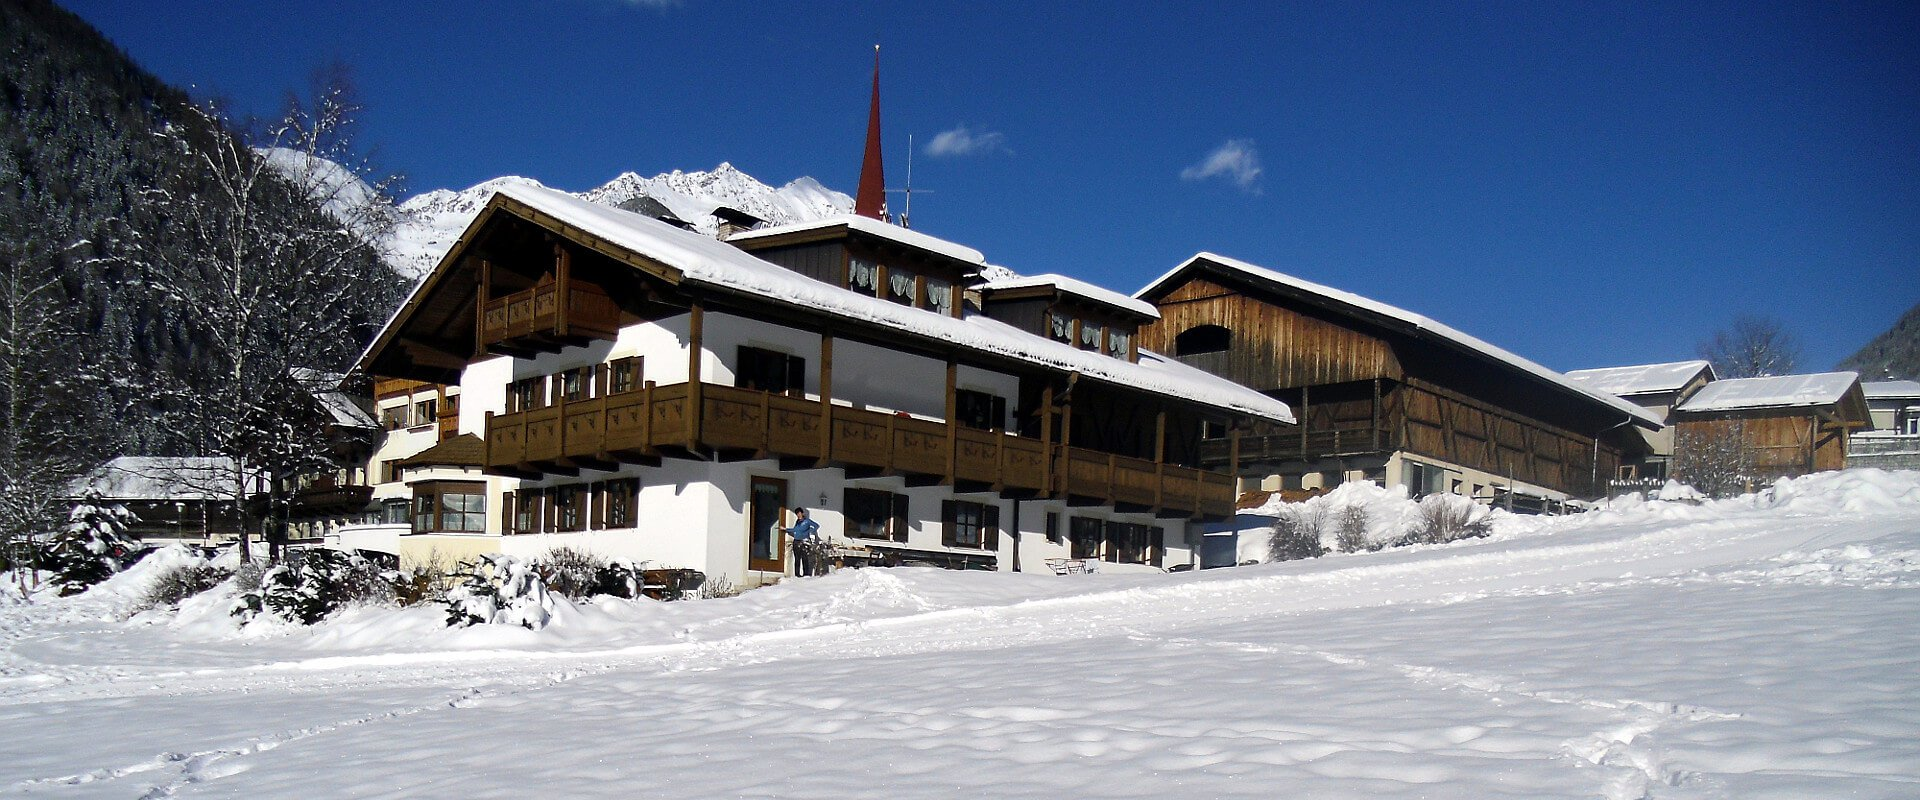 winterferien-suedtirol-01